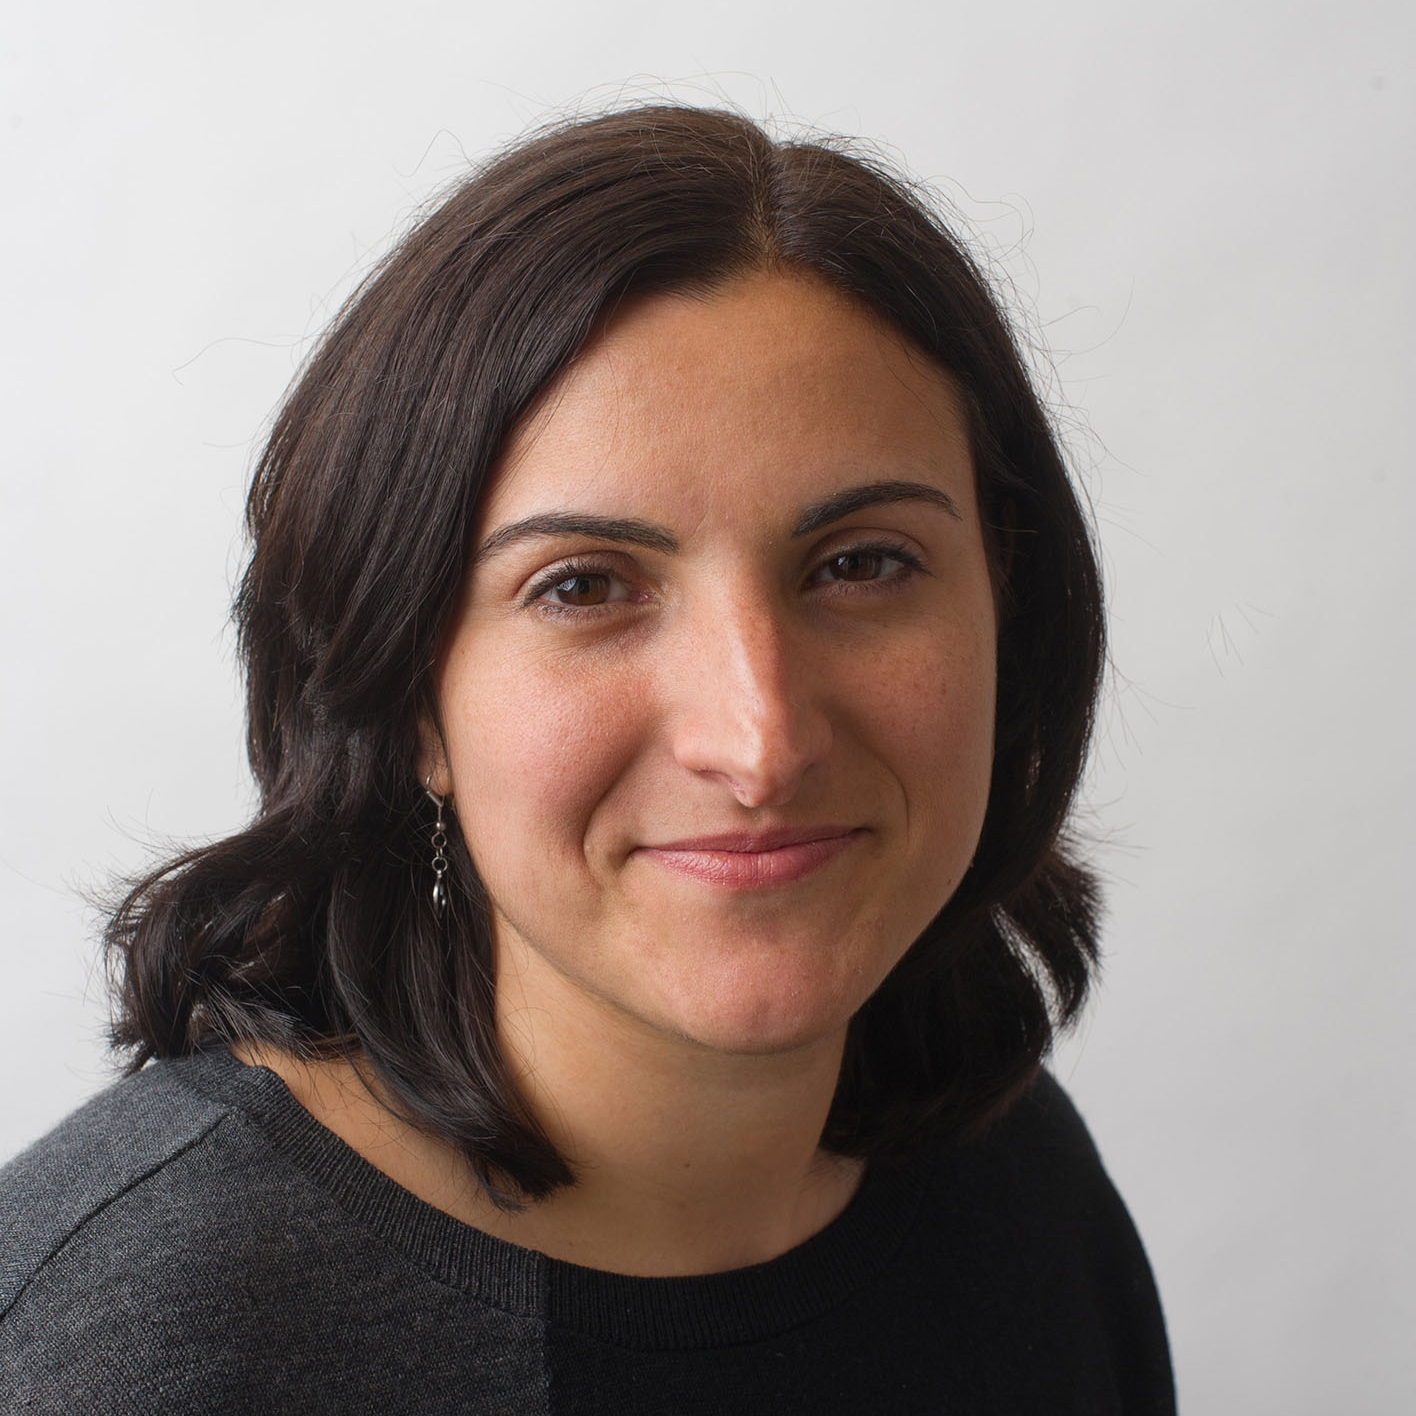 Patricia Romallo, AIA, NCARB, LEED AP BD+C